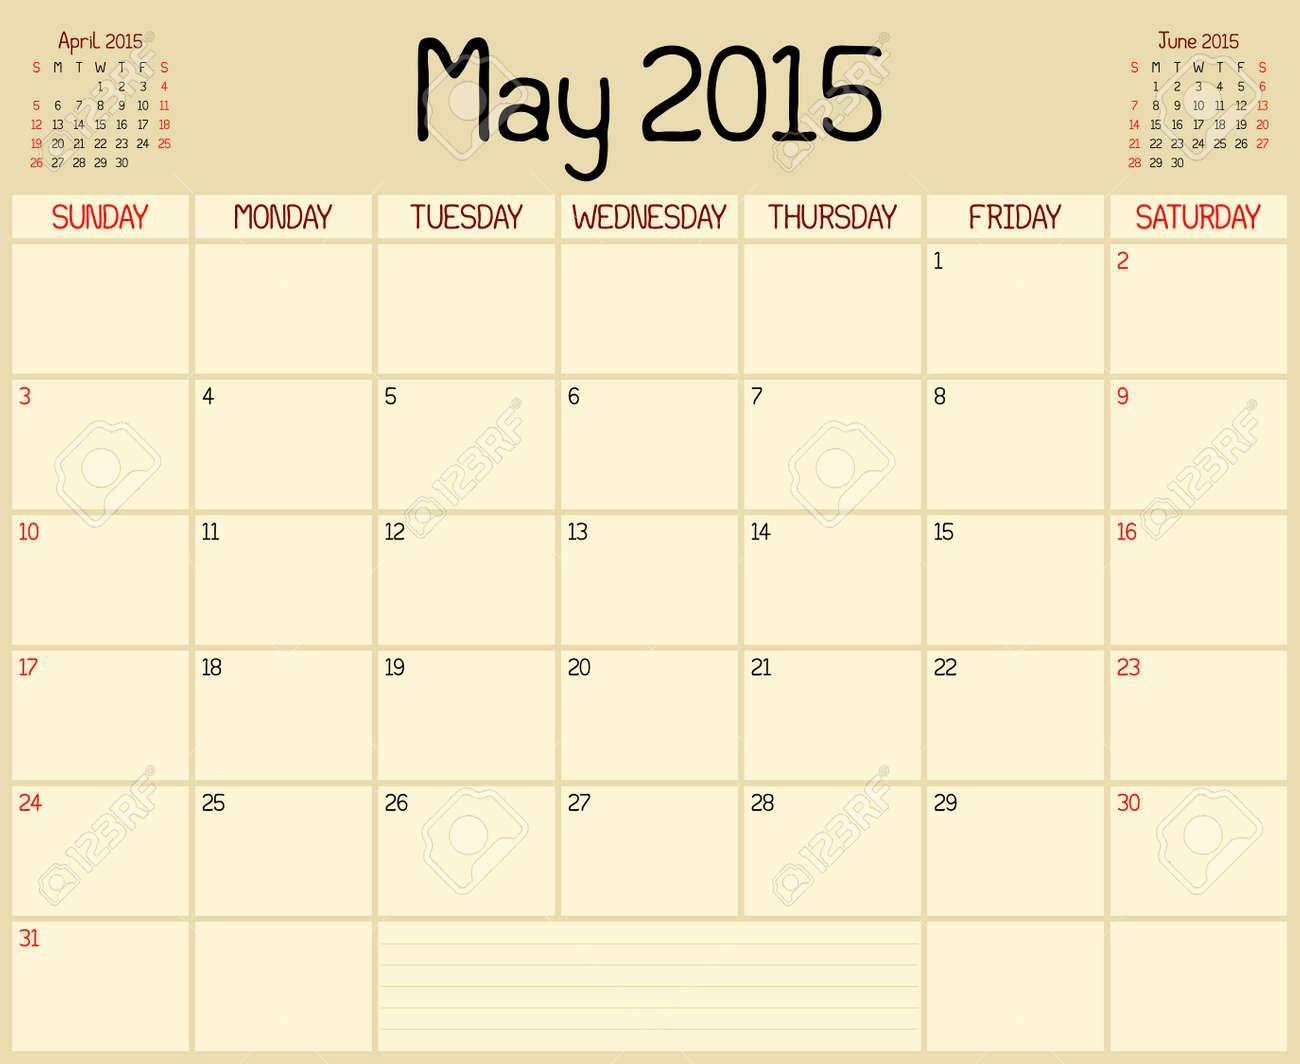 A Monthly Planner Calendar For May 2015. A Custom Handwritten ...